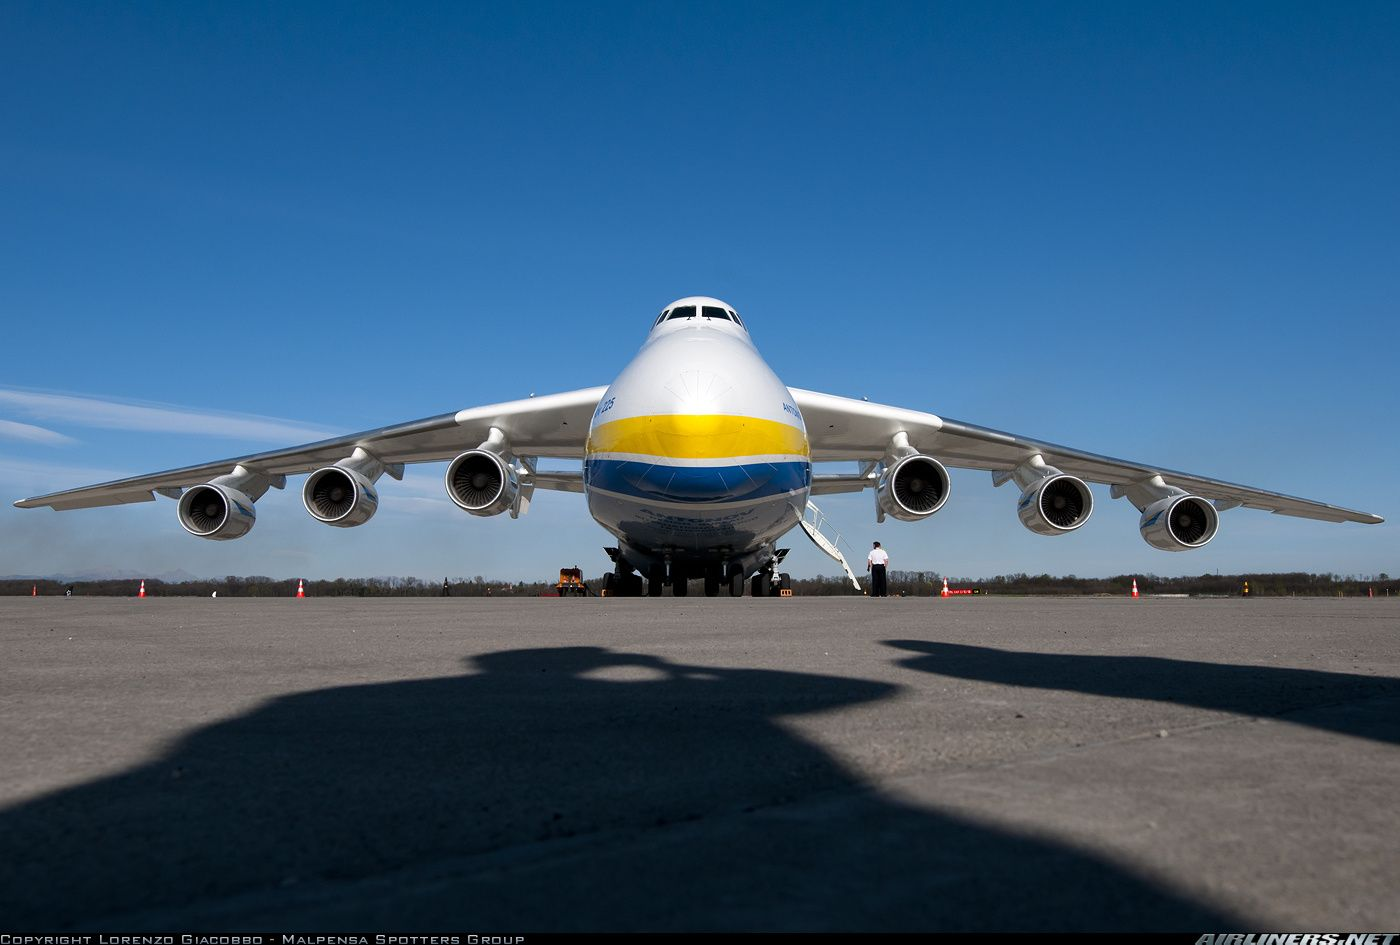 Antonov An 225 Mriya The Largest Airplane In The World Max